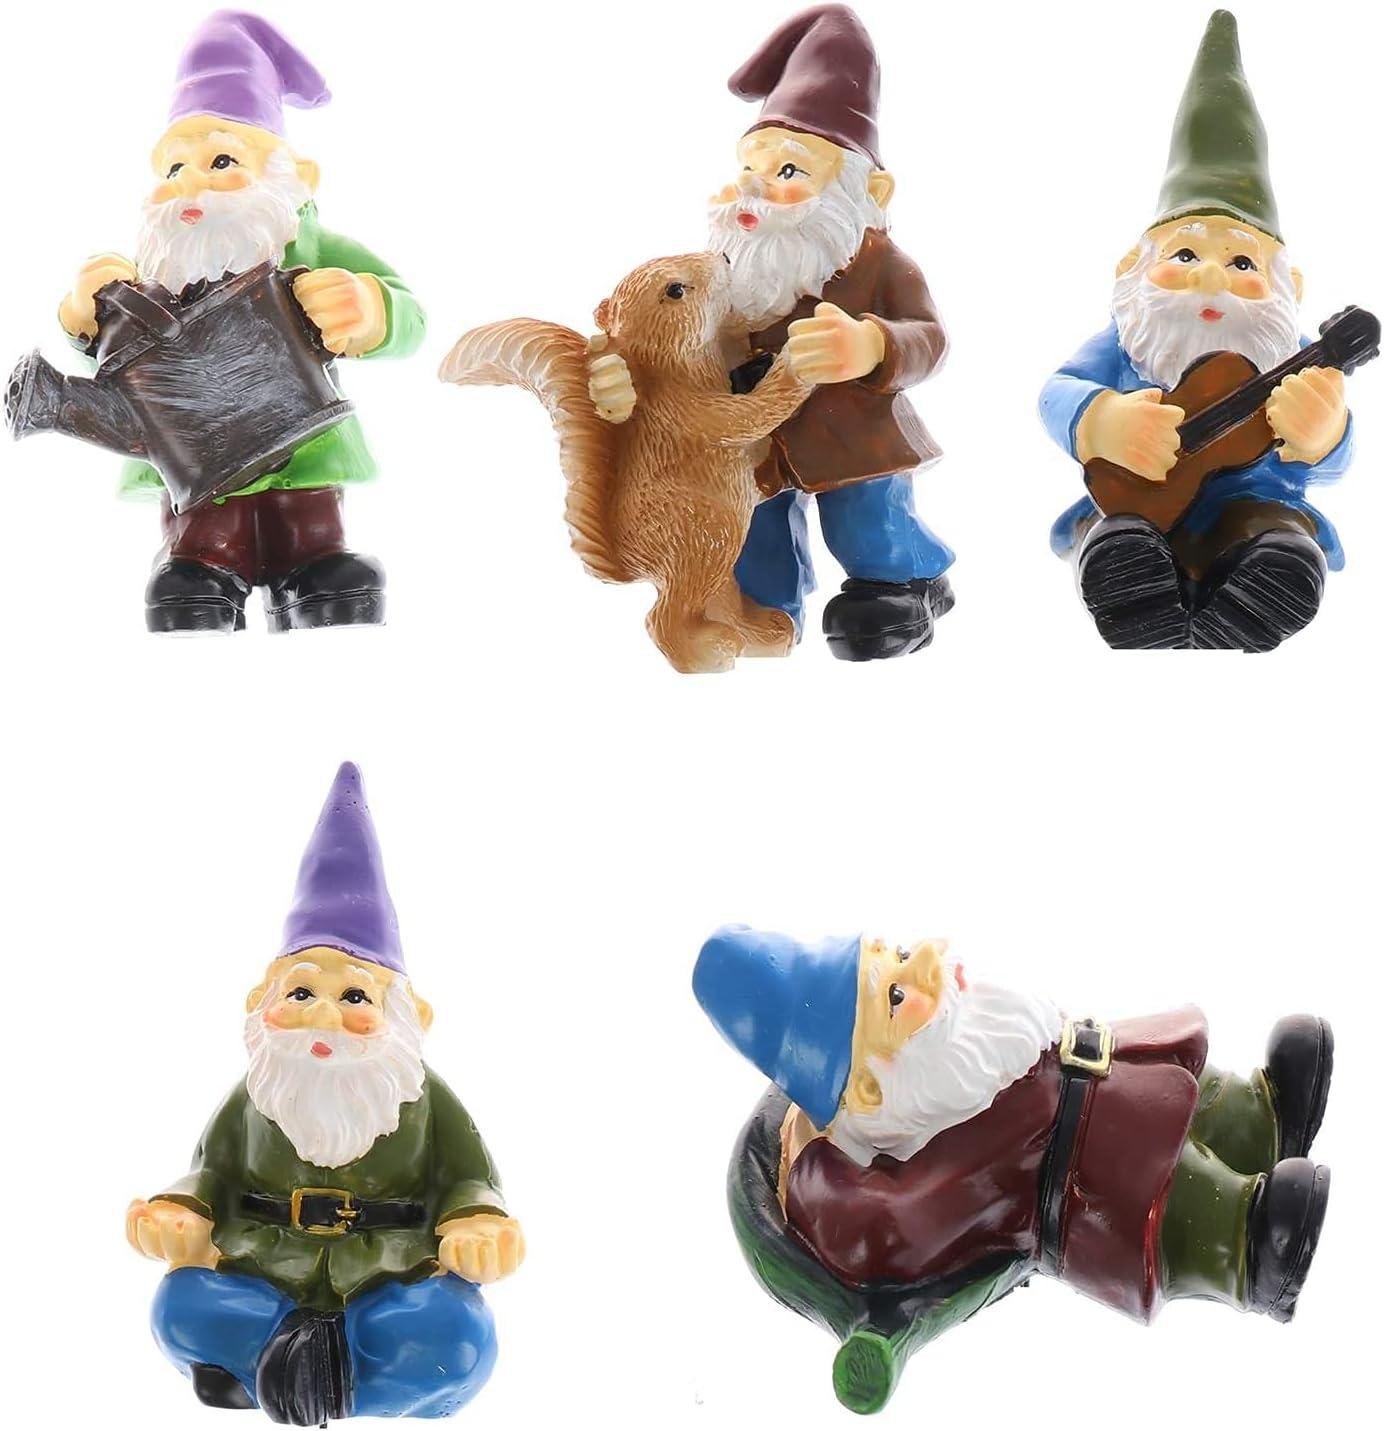 Uoeo Miniature Gnome Figurines Set of 5 - Fairy Gardens Dwarfs Statue Accessories for DIY Dollhouse Decor Outdoor Home Decoration